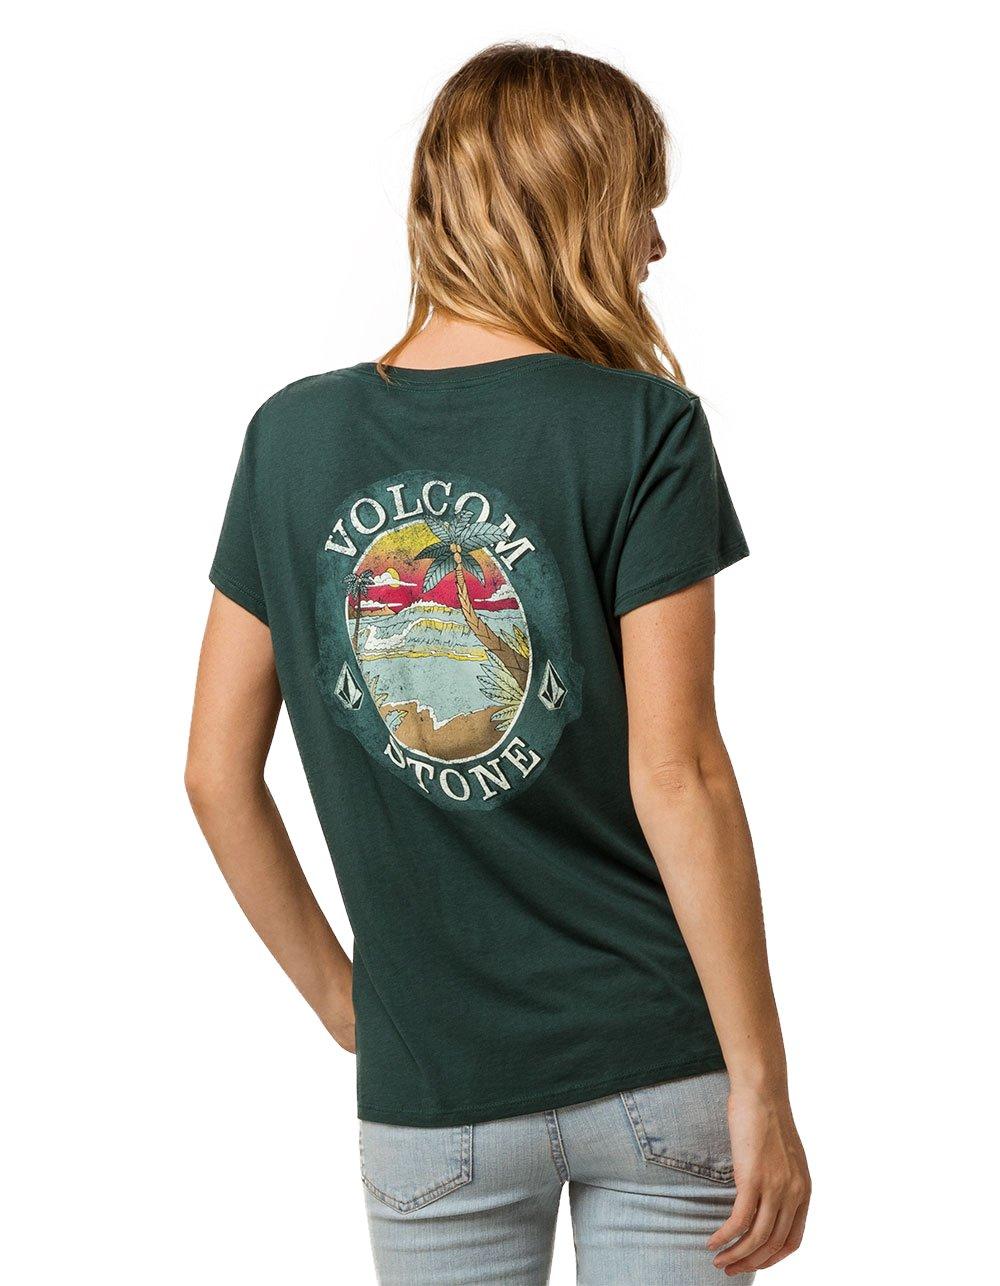 Volcom Beach Brews Tee, Green, Small